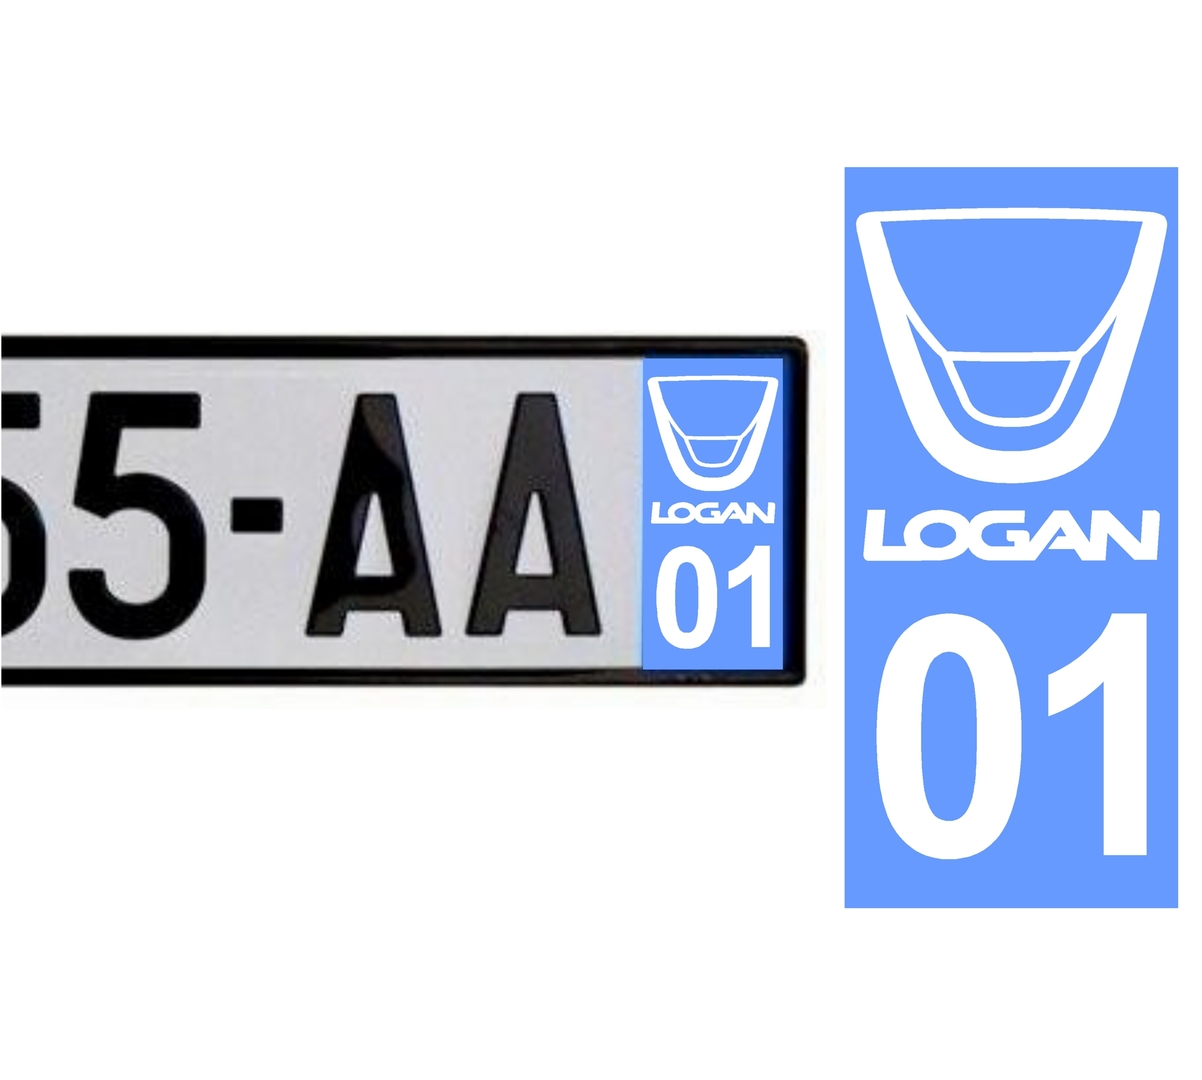 stickers-dacia-ref44-aventure-duster-4x4-renault-stickers-autocollant-logan-sandero-decoration-plaque-immatriculation-adhesive